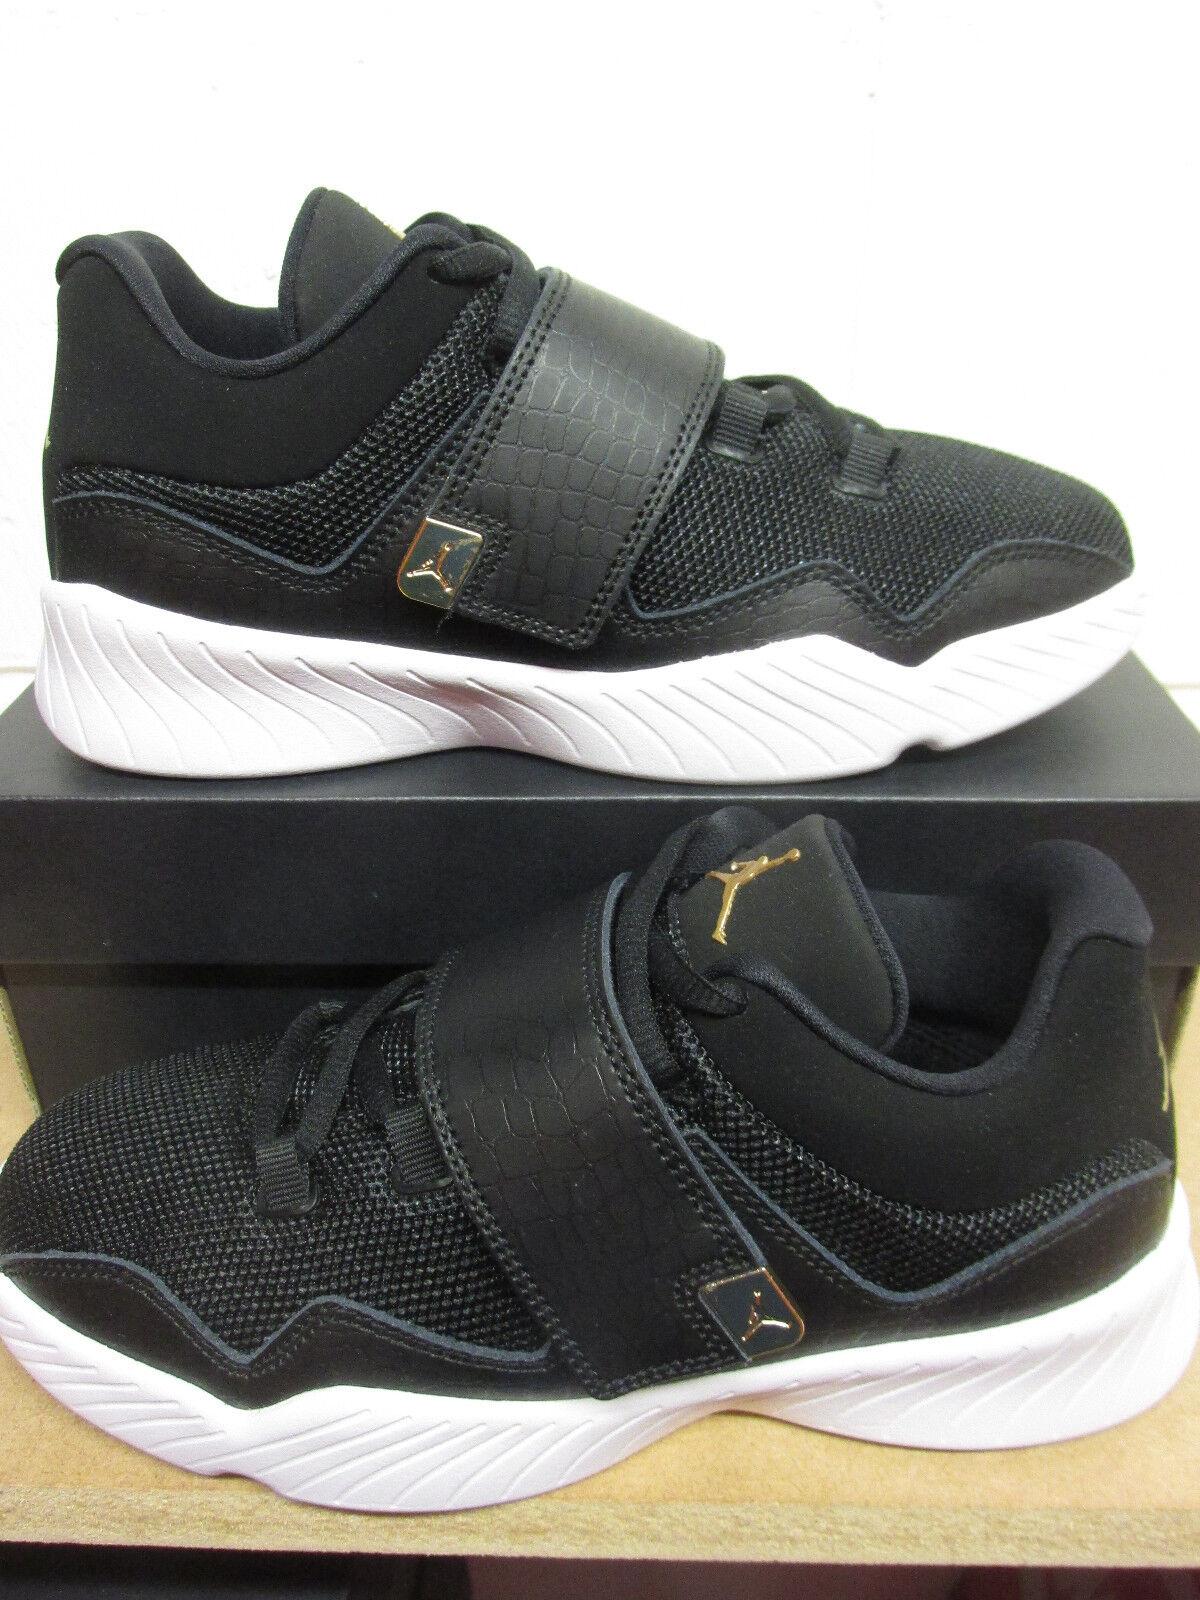 Nike Air Jordan J23 BG Basket Formatori 854558 004 Scarpe Da Ginnastica Scarpe